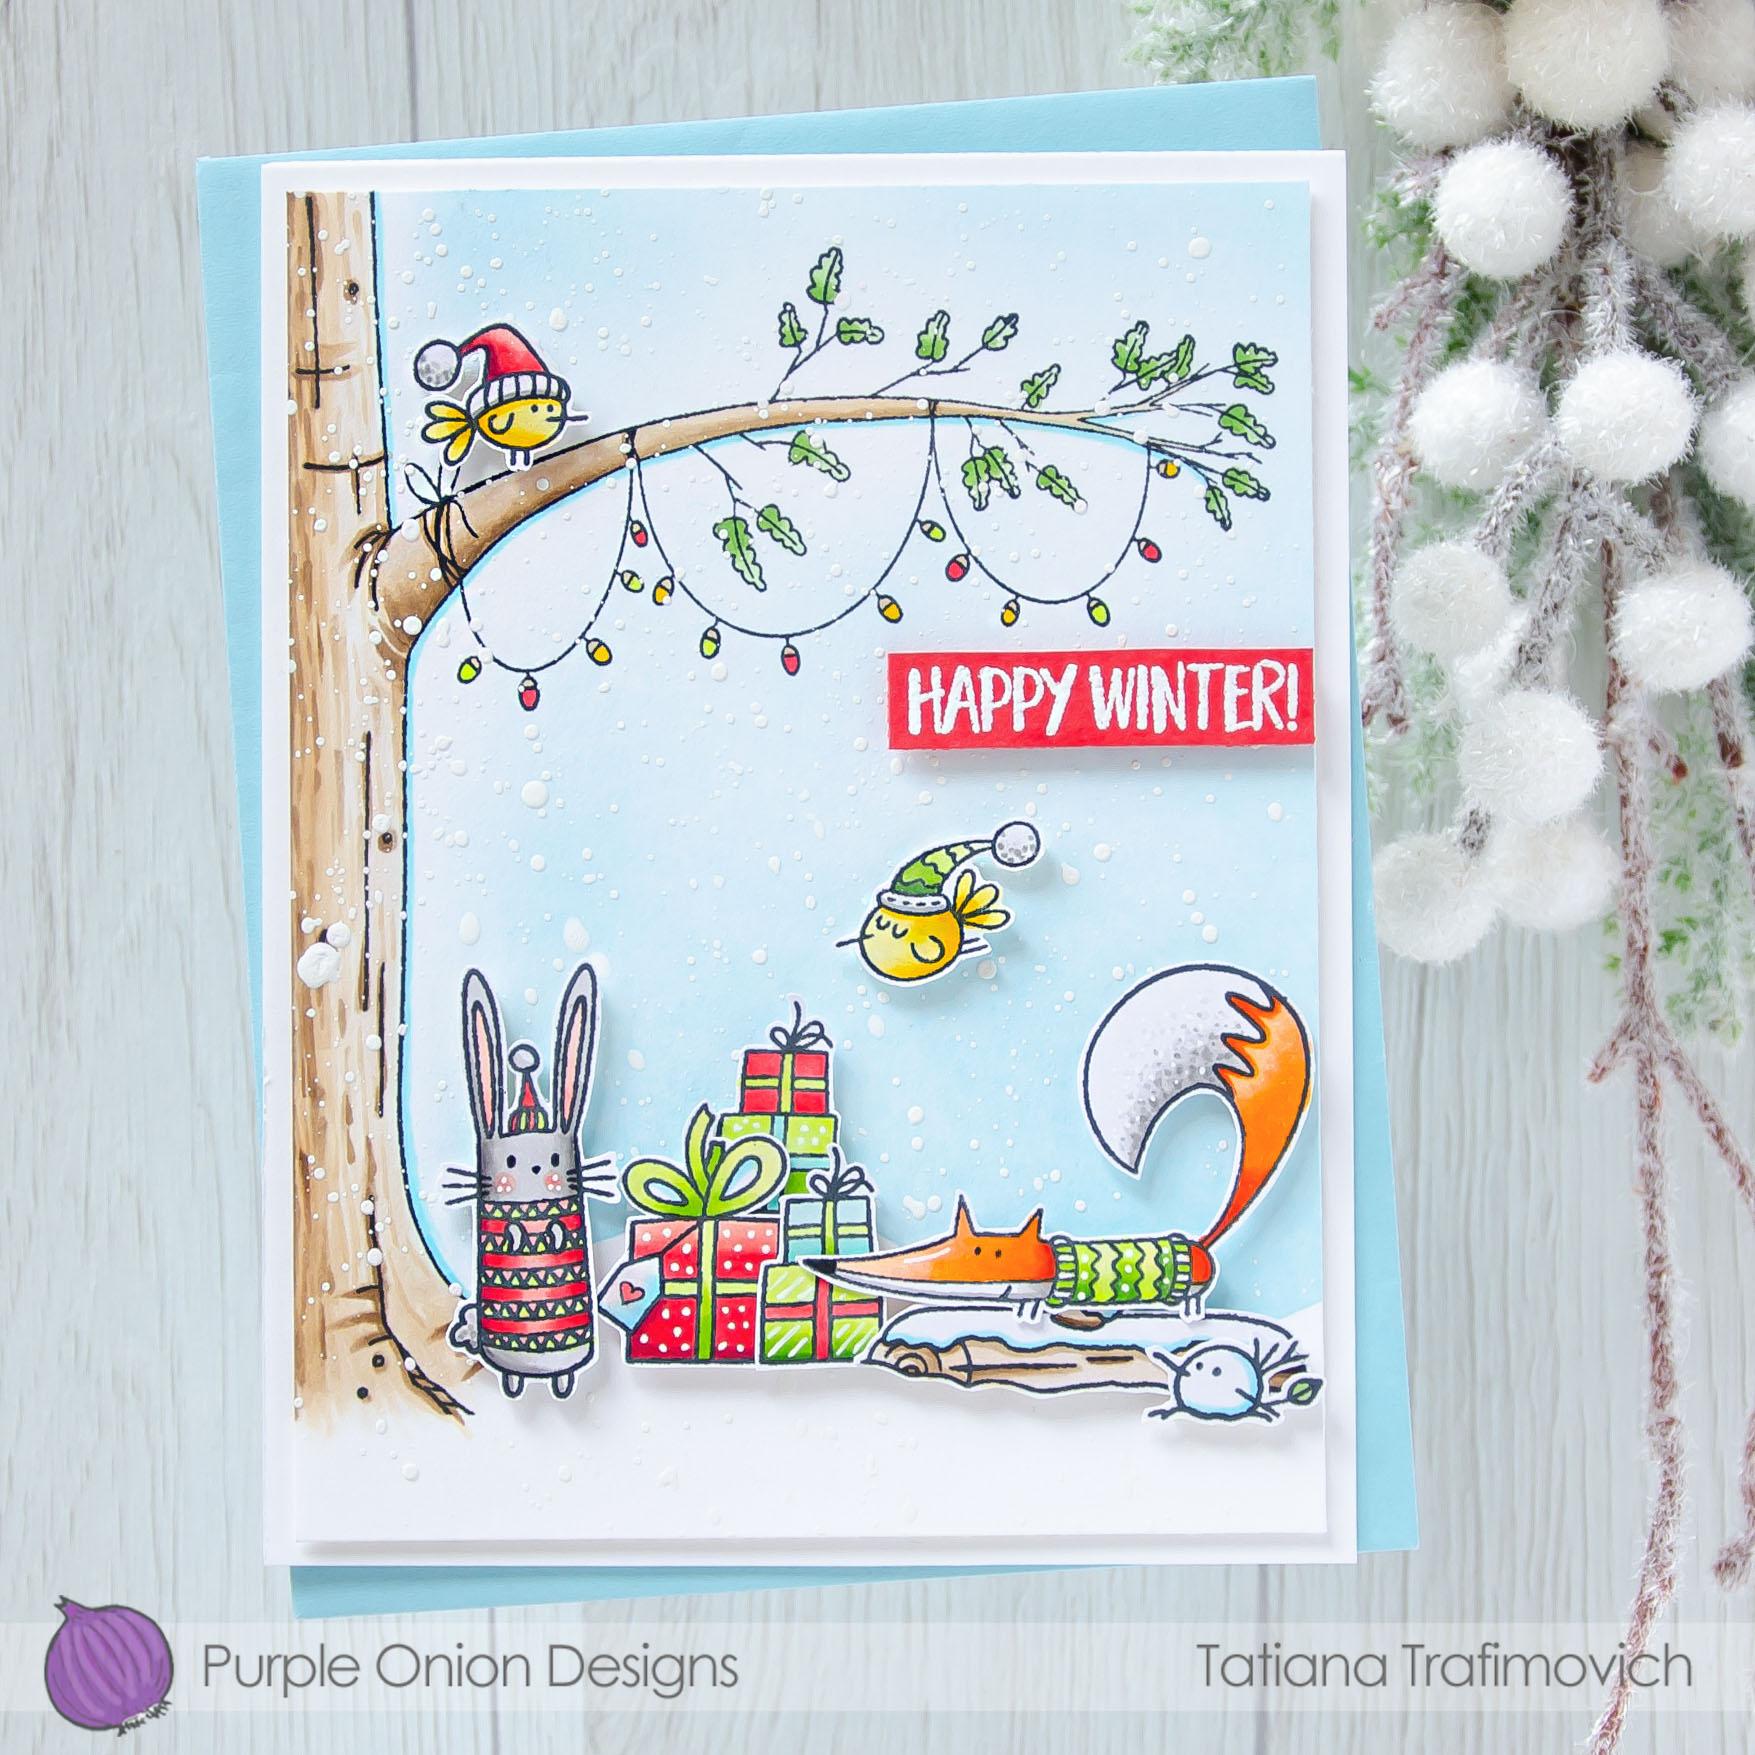 Happy Winter #handmade card by Tatiana Trafimovich #tatianacraftandart - stamps by Purple Onion Designs